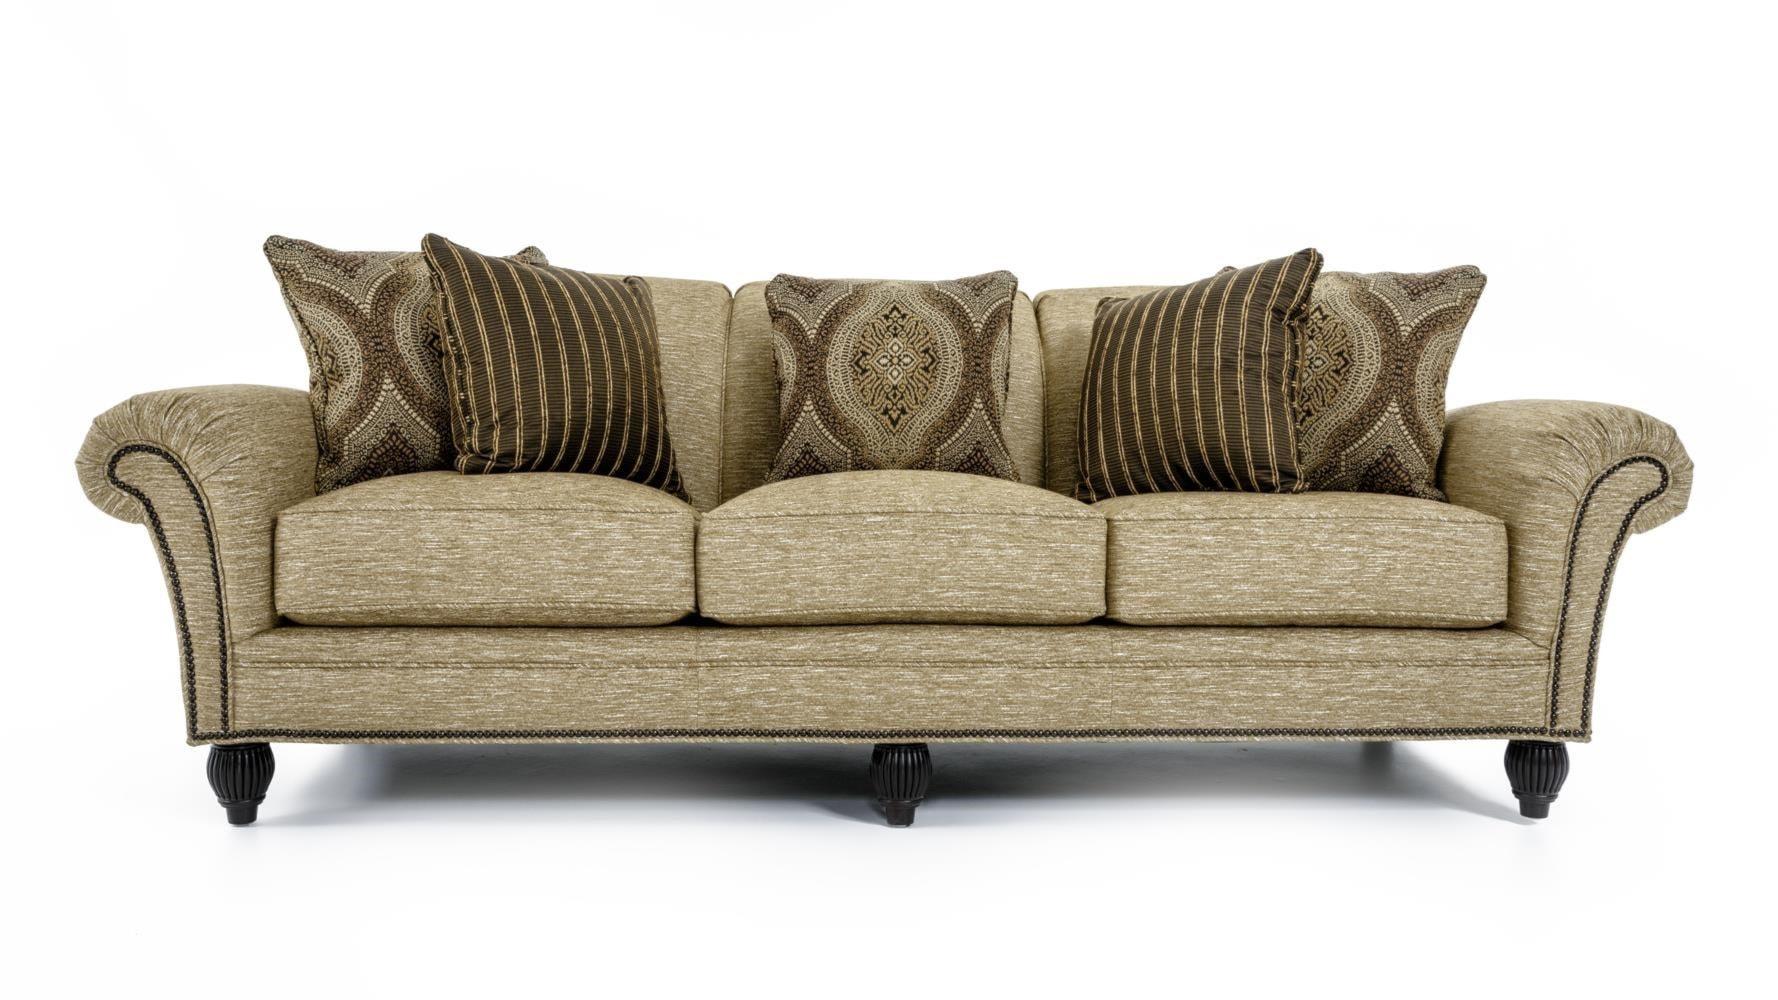 Tommy Bahama Home Royal Kahala 7699 33 Edgewater Sofa